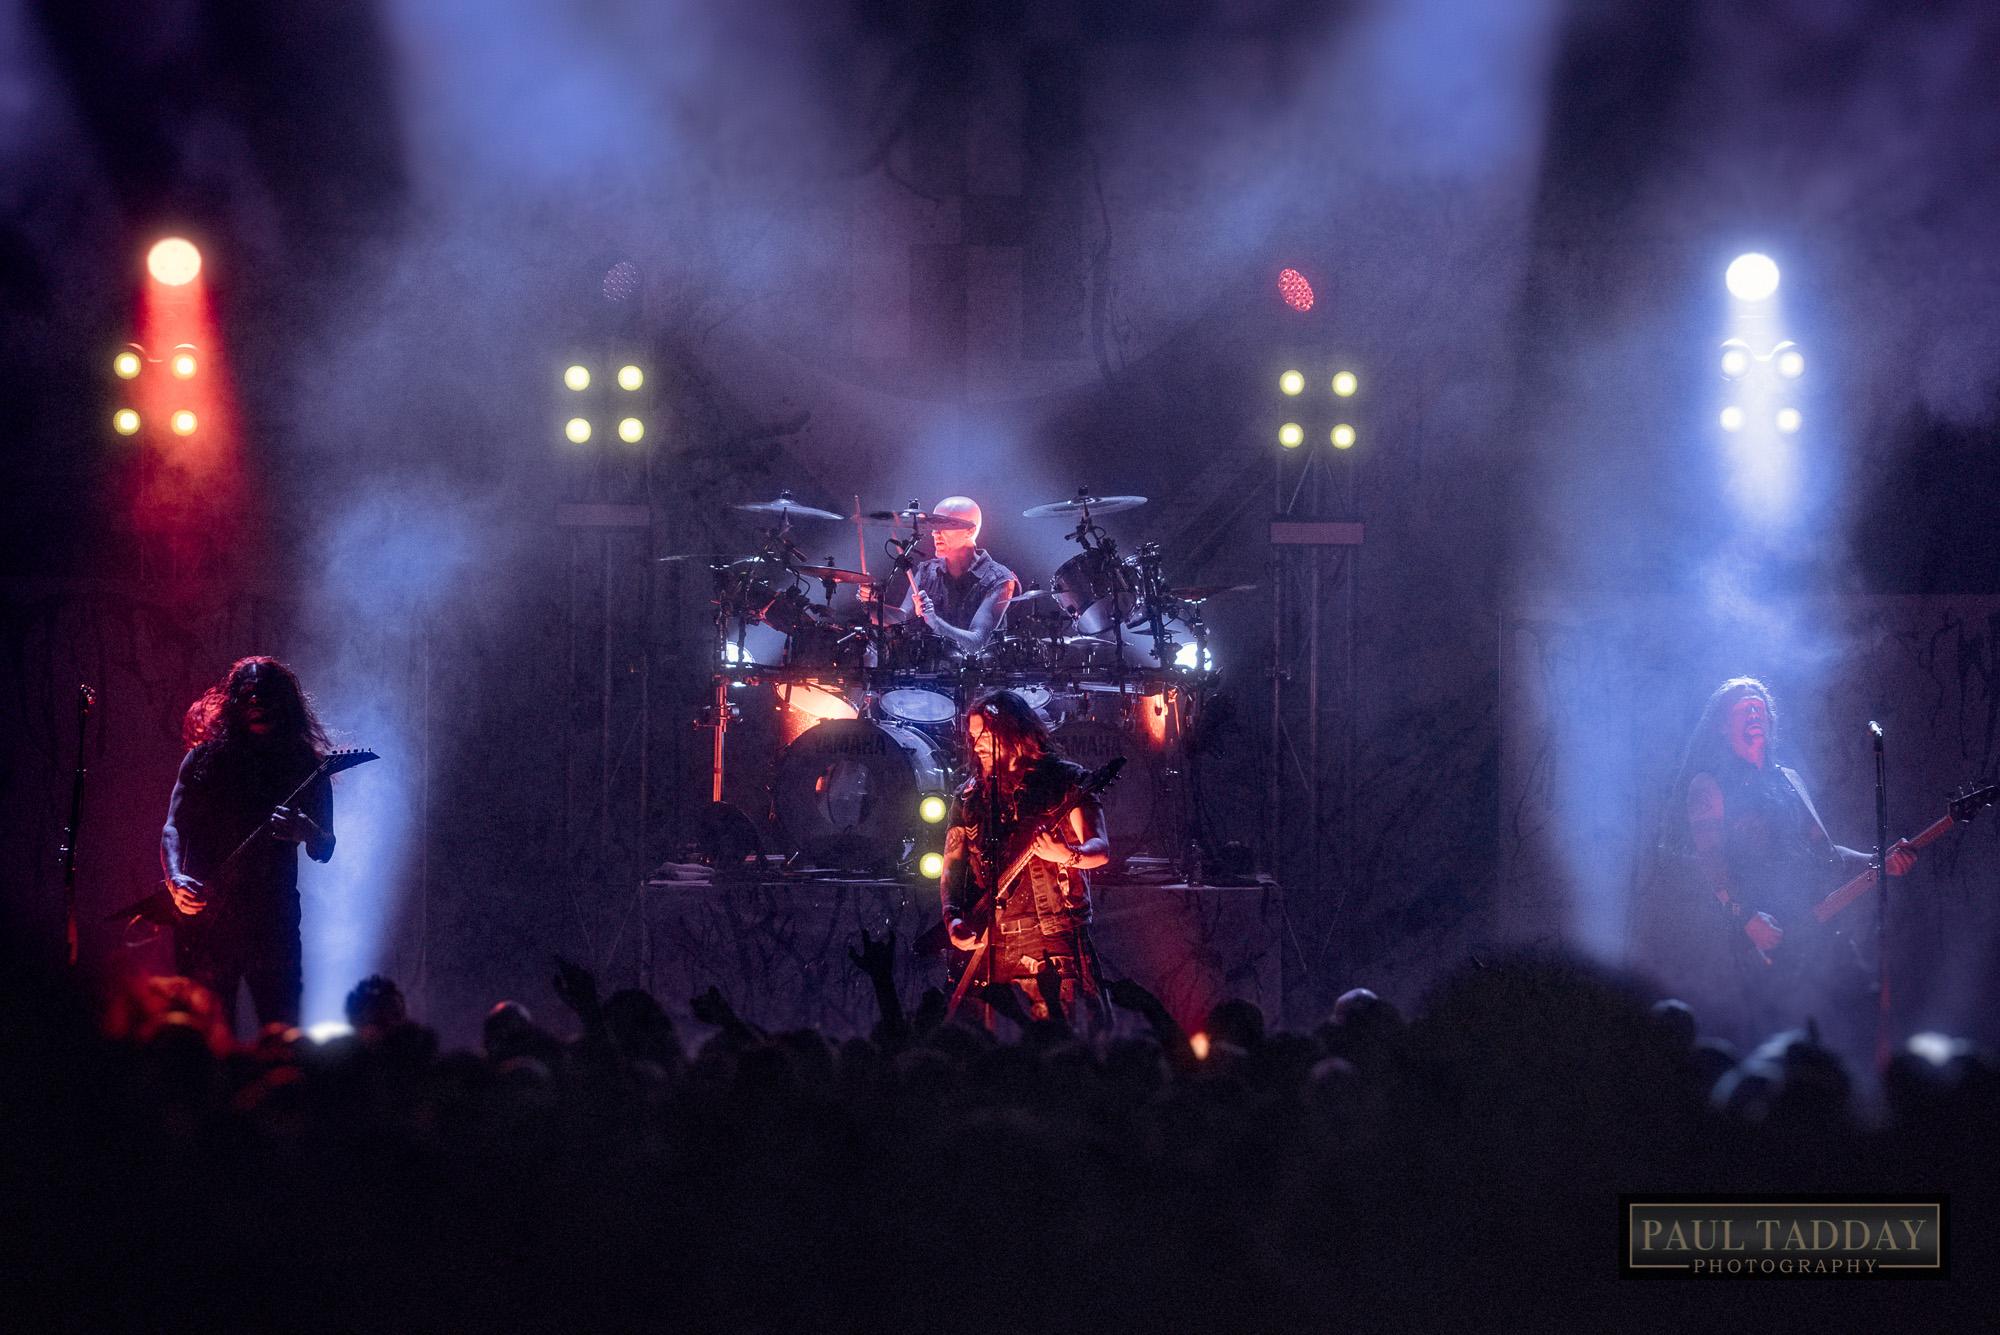 MachineHead-2018-PaulTaddayPhotography-066.jpg